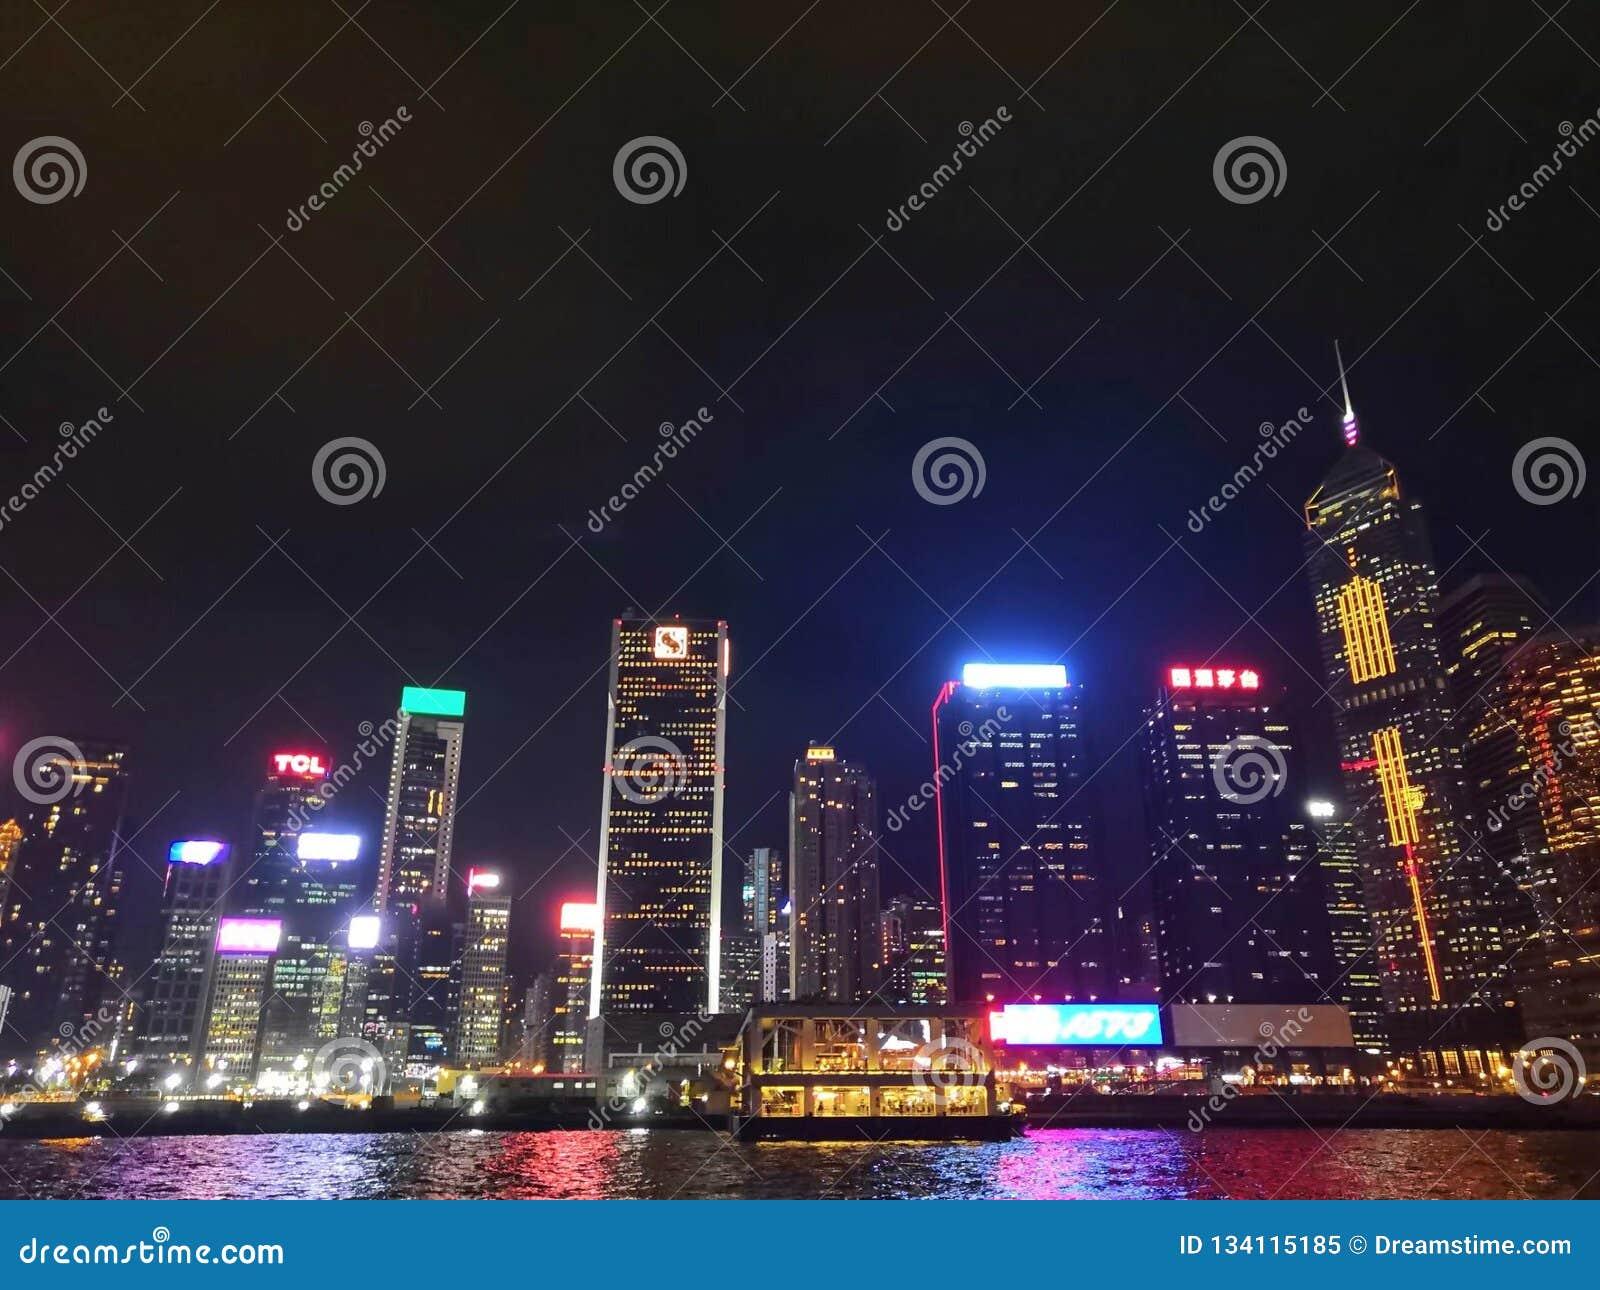 香港-维多利亚港夜景 -无与伦比的魅力 Hong Kong - Victoria Harbour Nightscape - Unmatched Charm